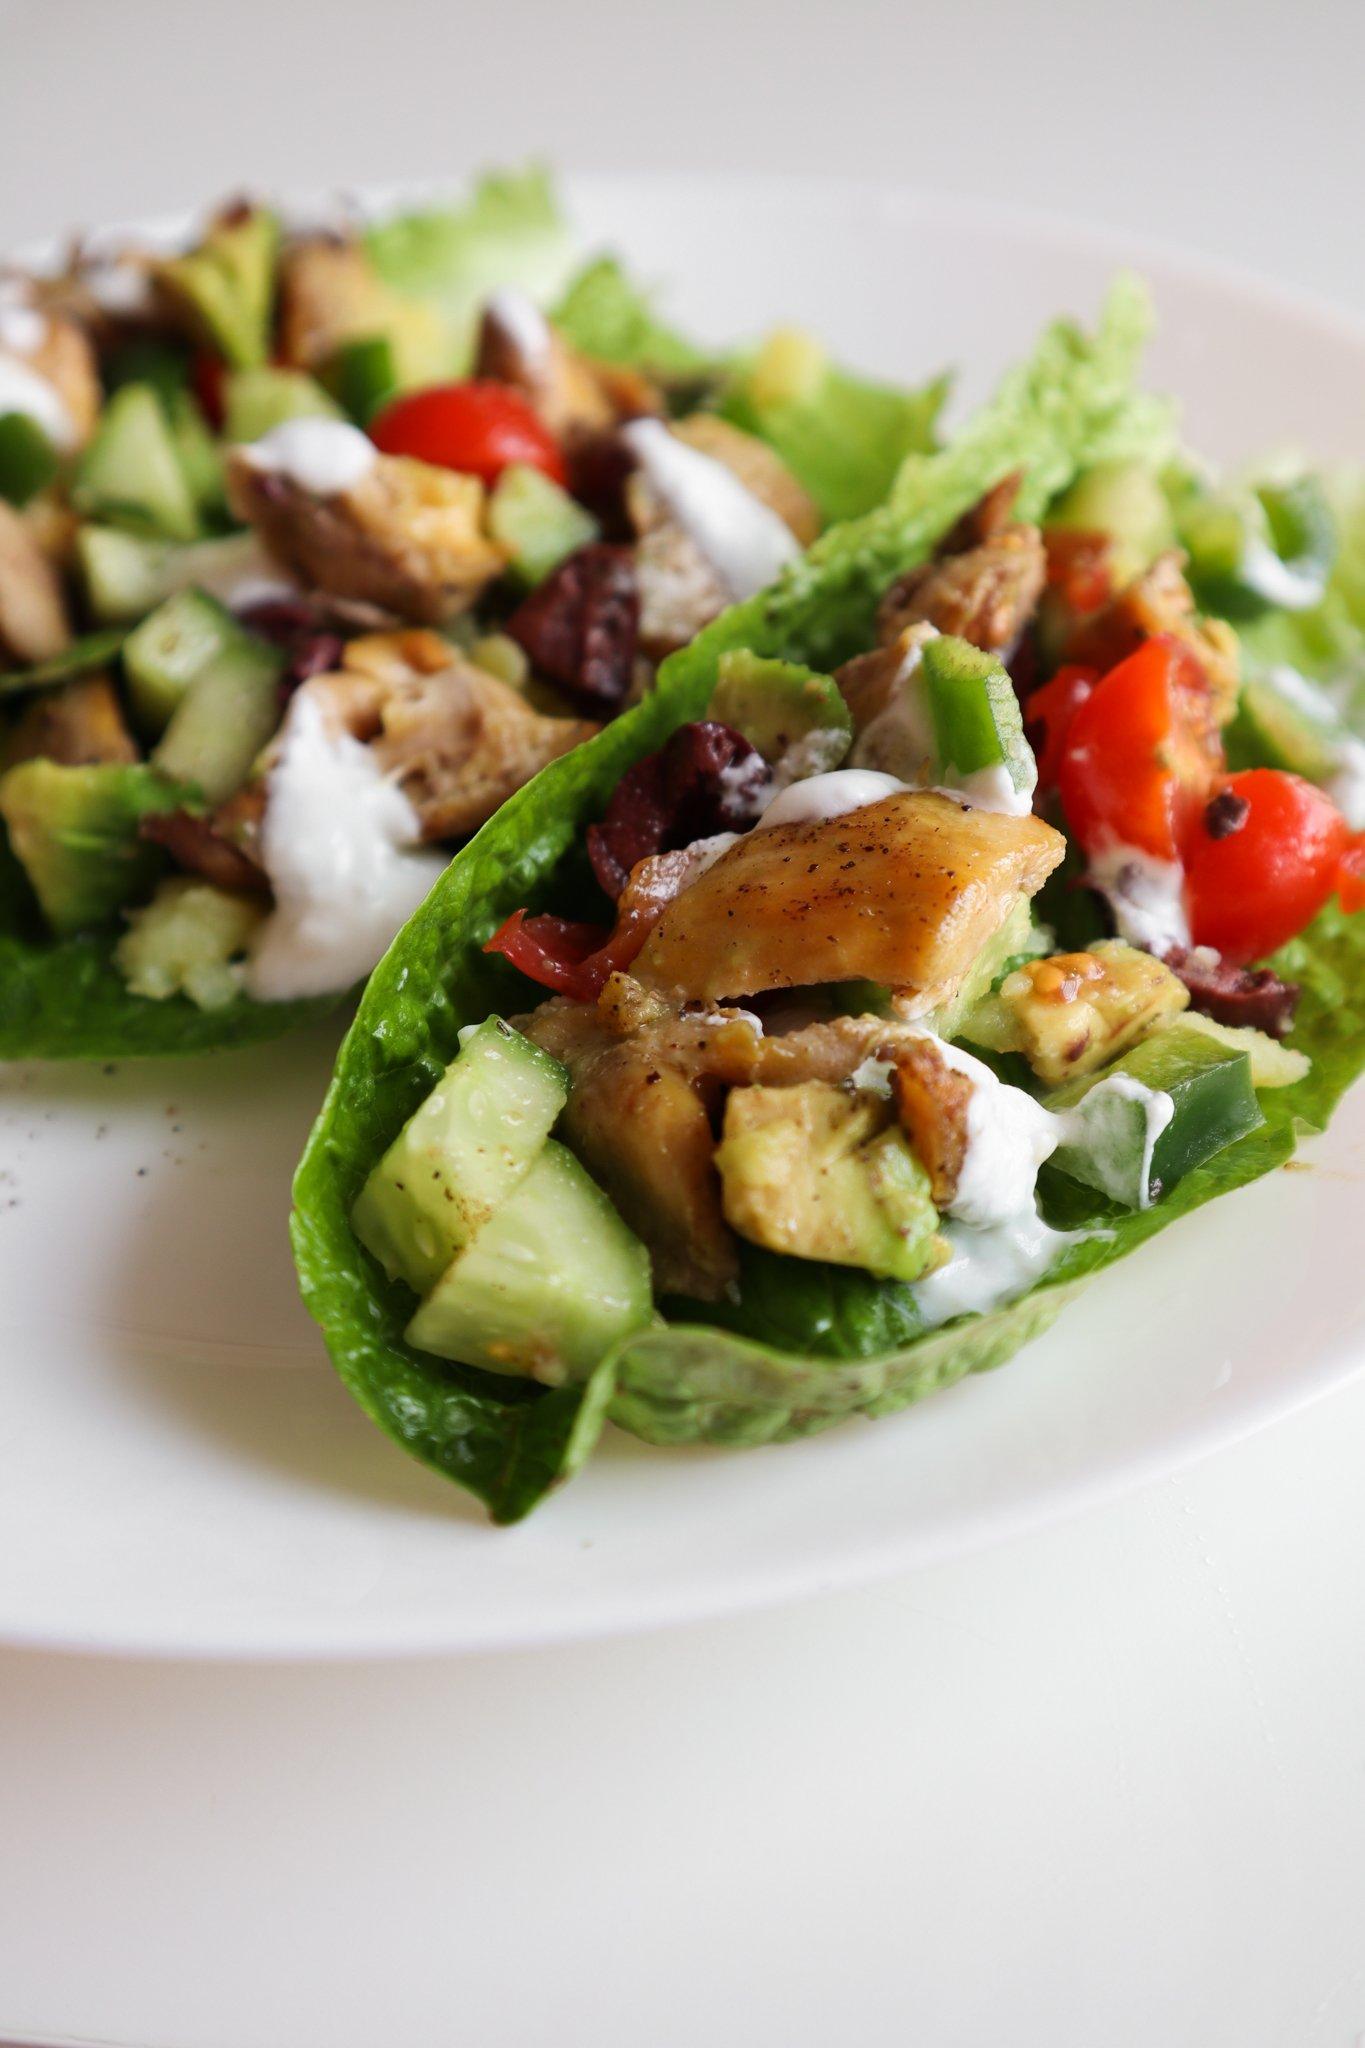 Mediterranean Chicken lettuce wraps - clean eating recipe